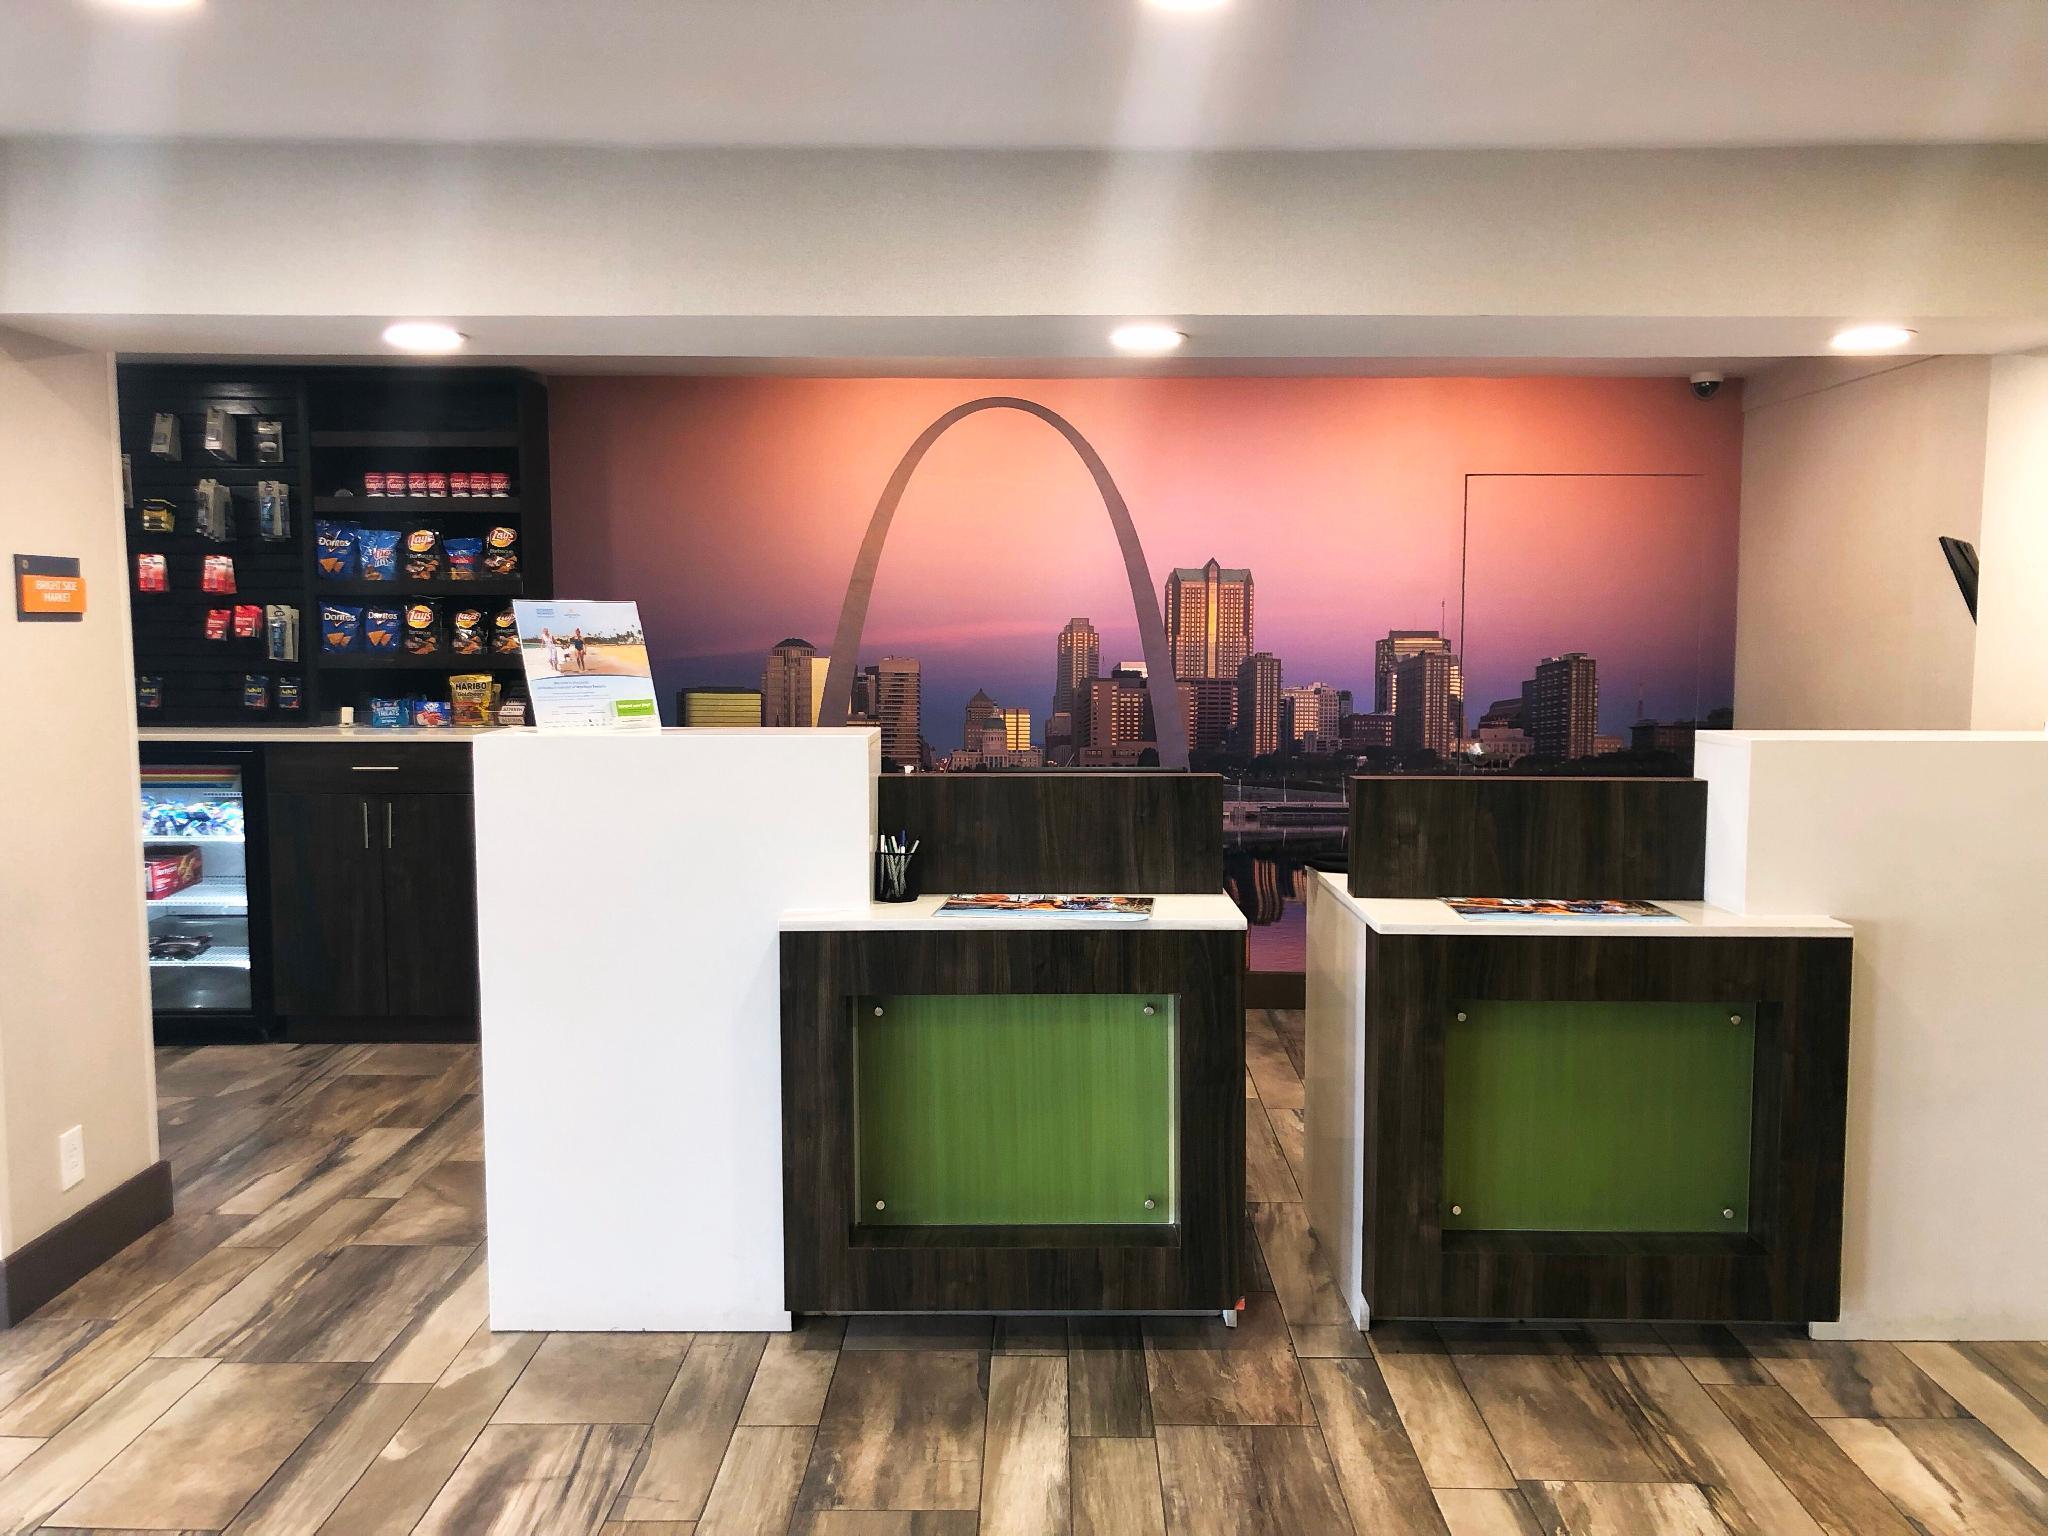 La Quinta Inn By Wyndham St. Louis Hazelwood   Airport North